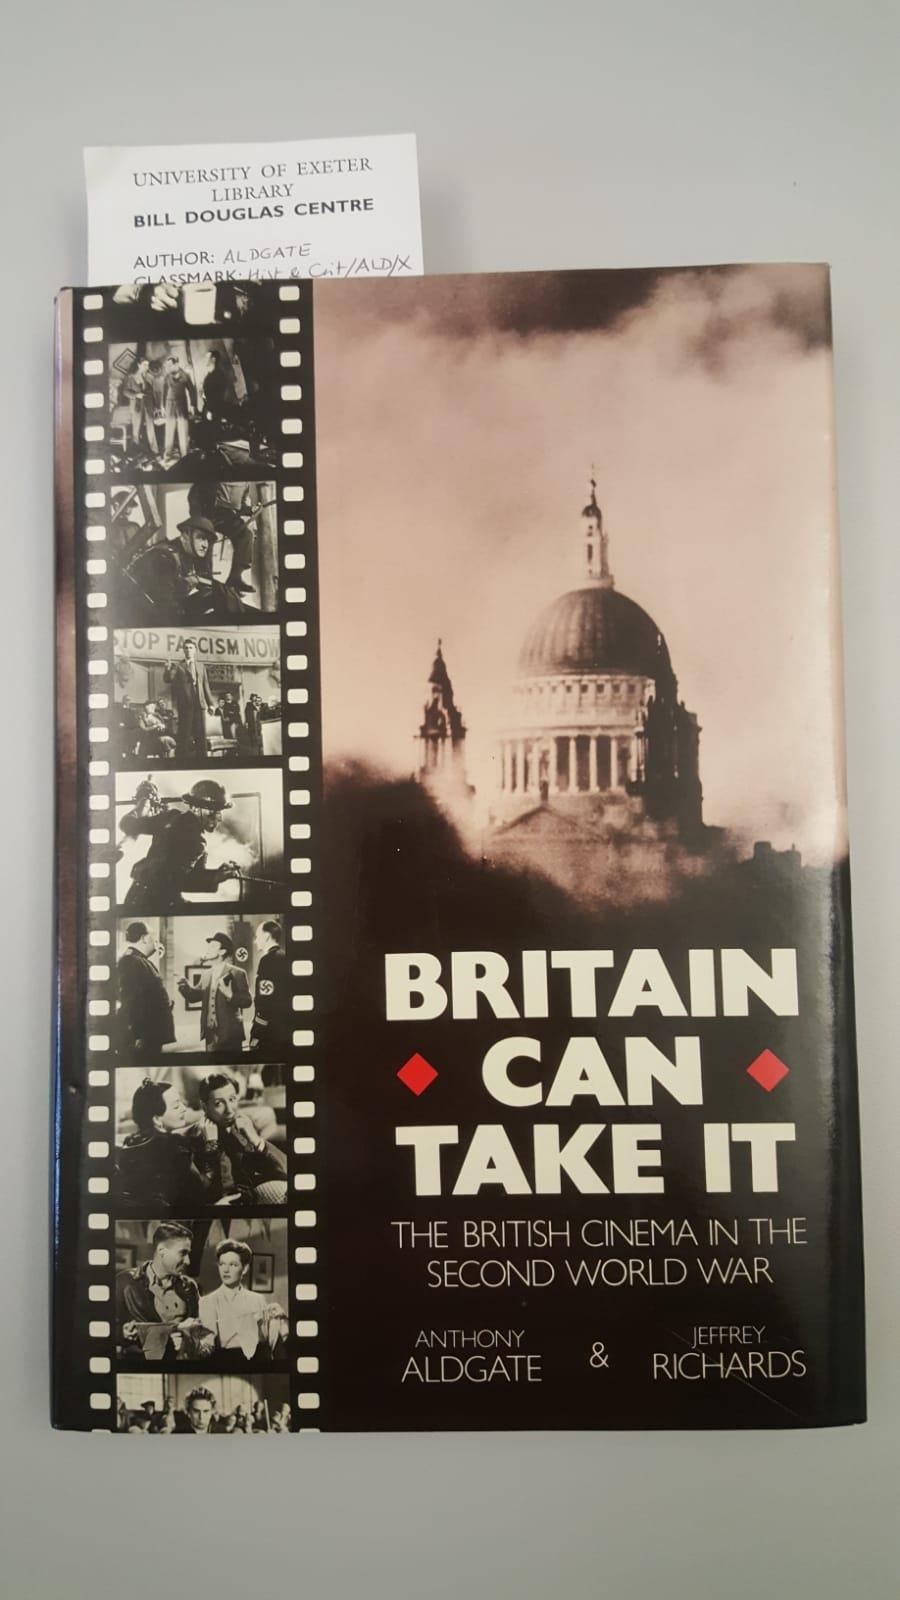 Week 8, Group D: British Cinema and World War II | Doing Film History